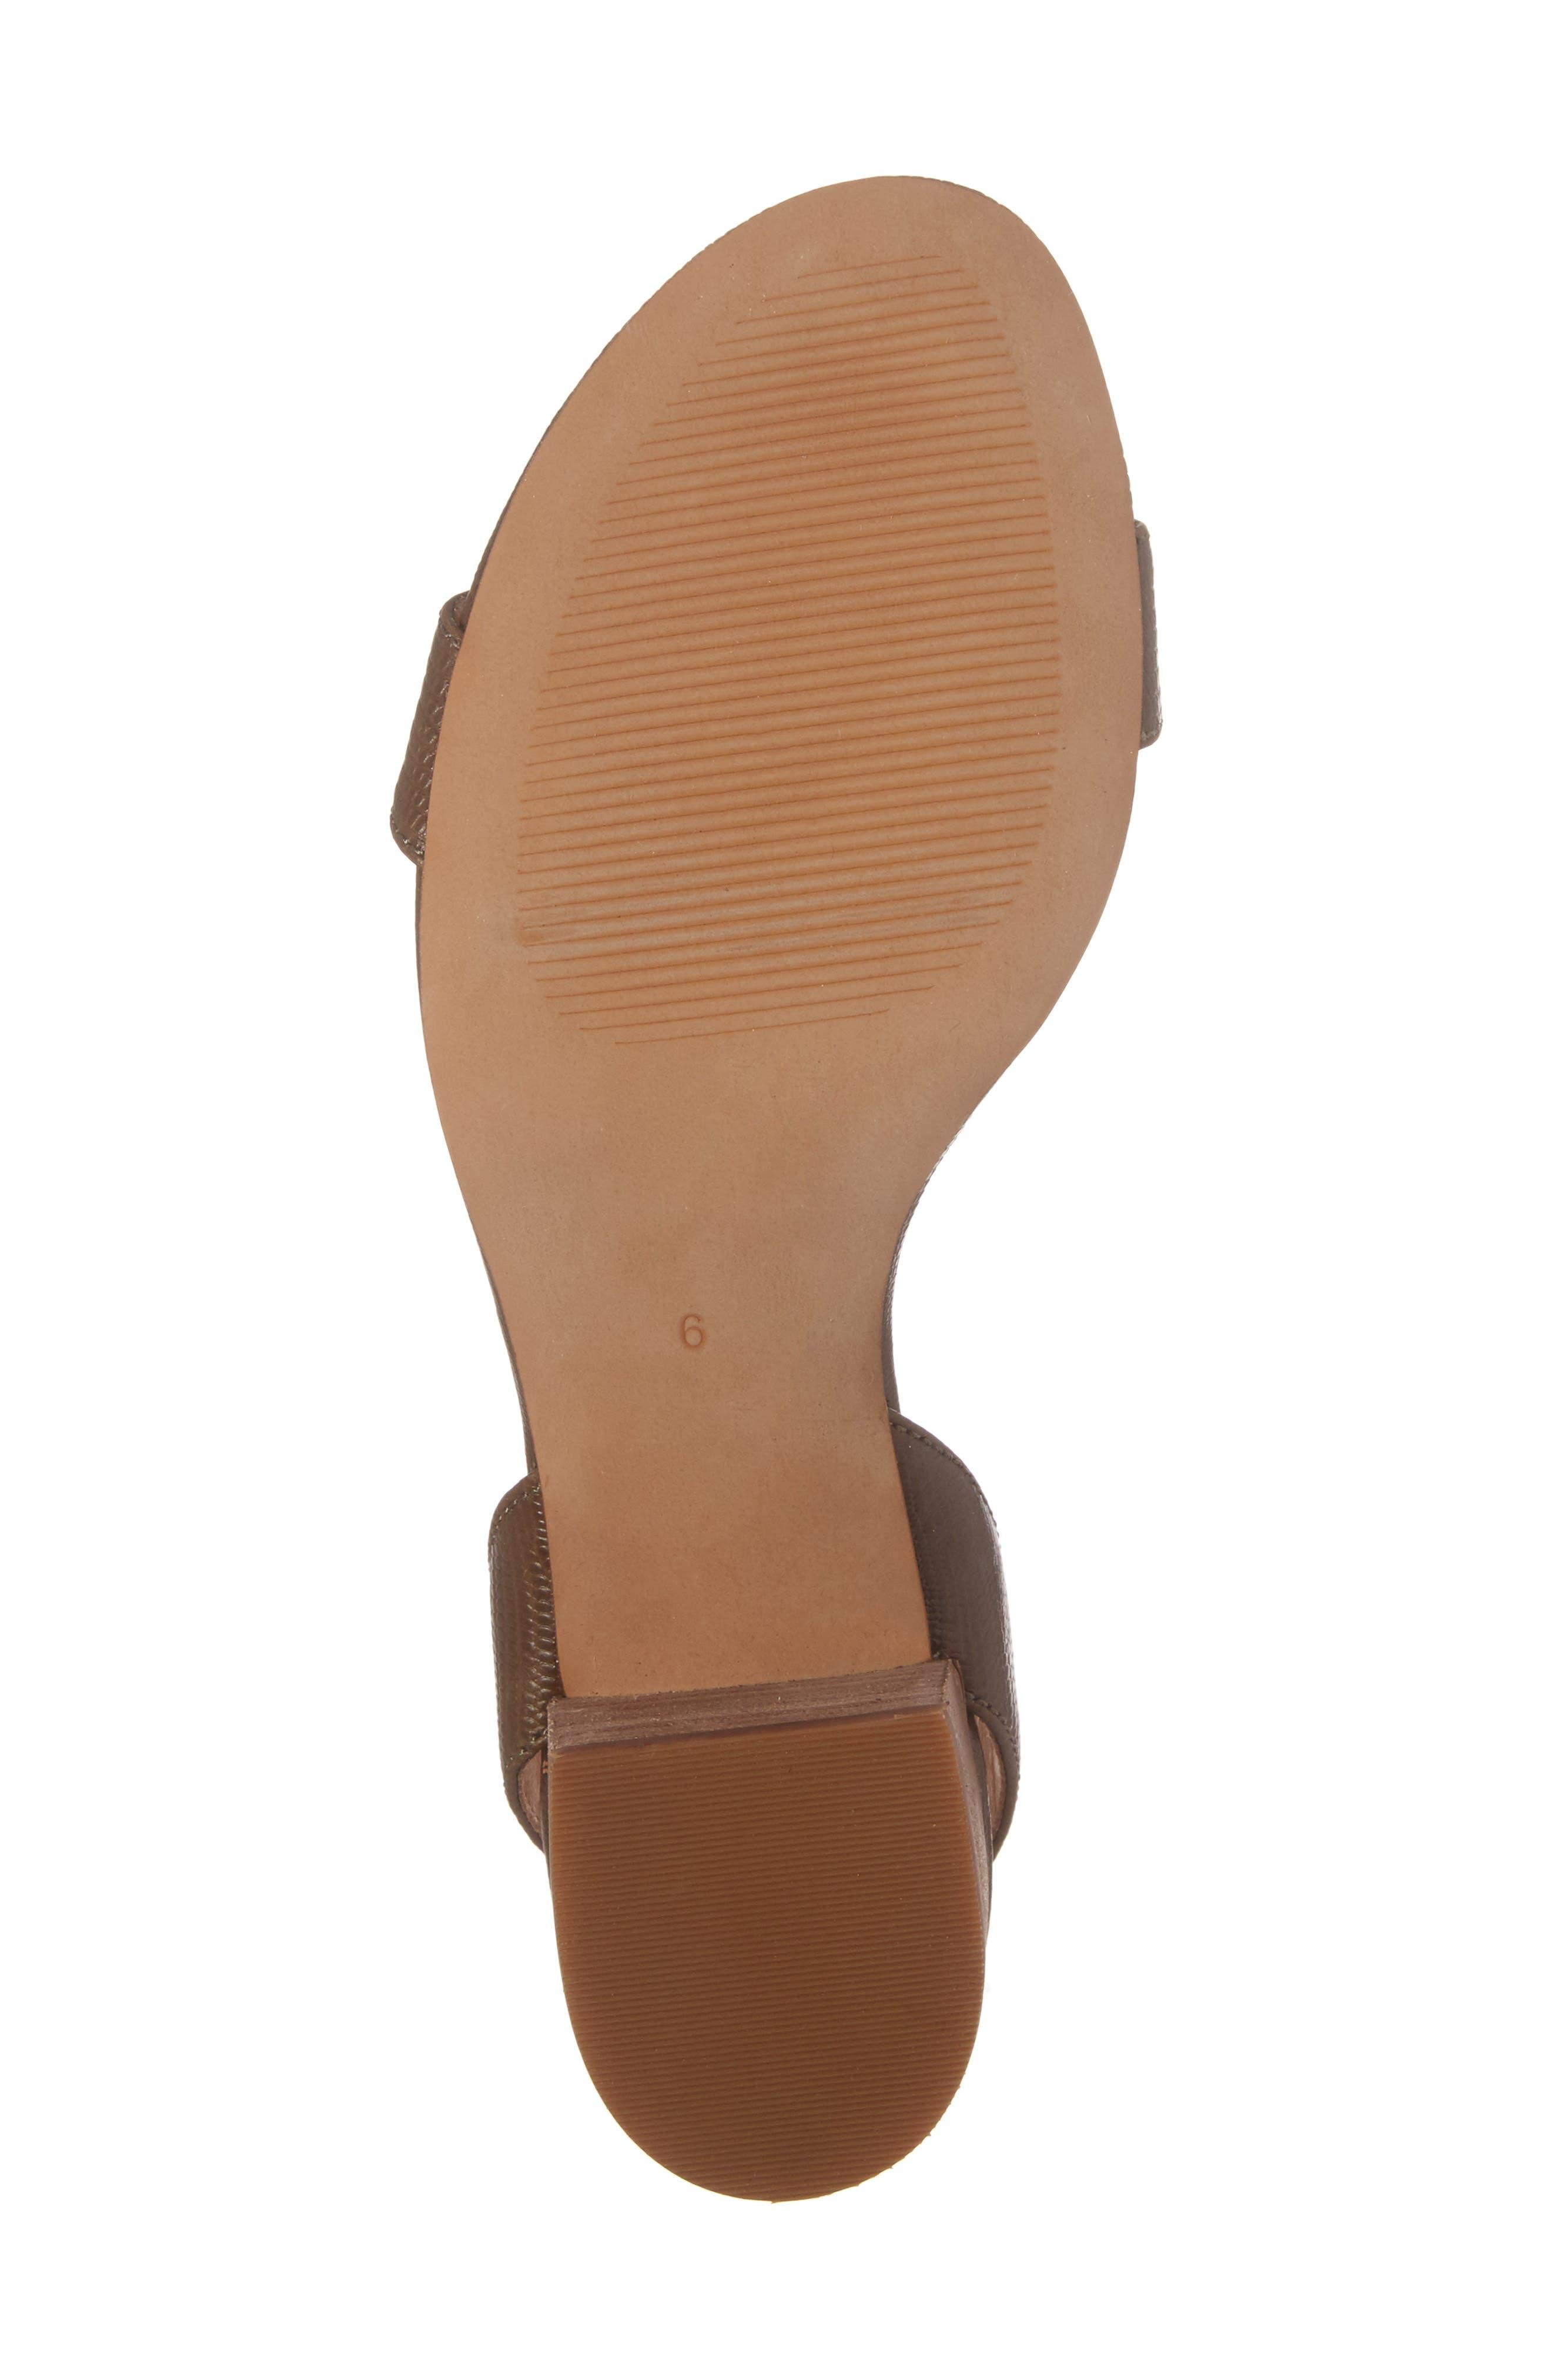 Alice Embossed Ankle Wrap Sandal,                             Alternate thumbnail 6, color,                             Safari Khaki Leather